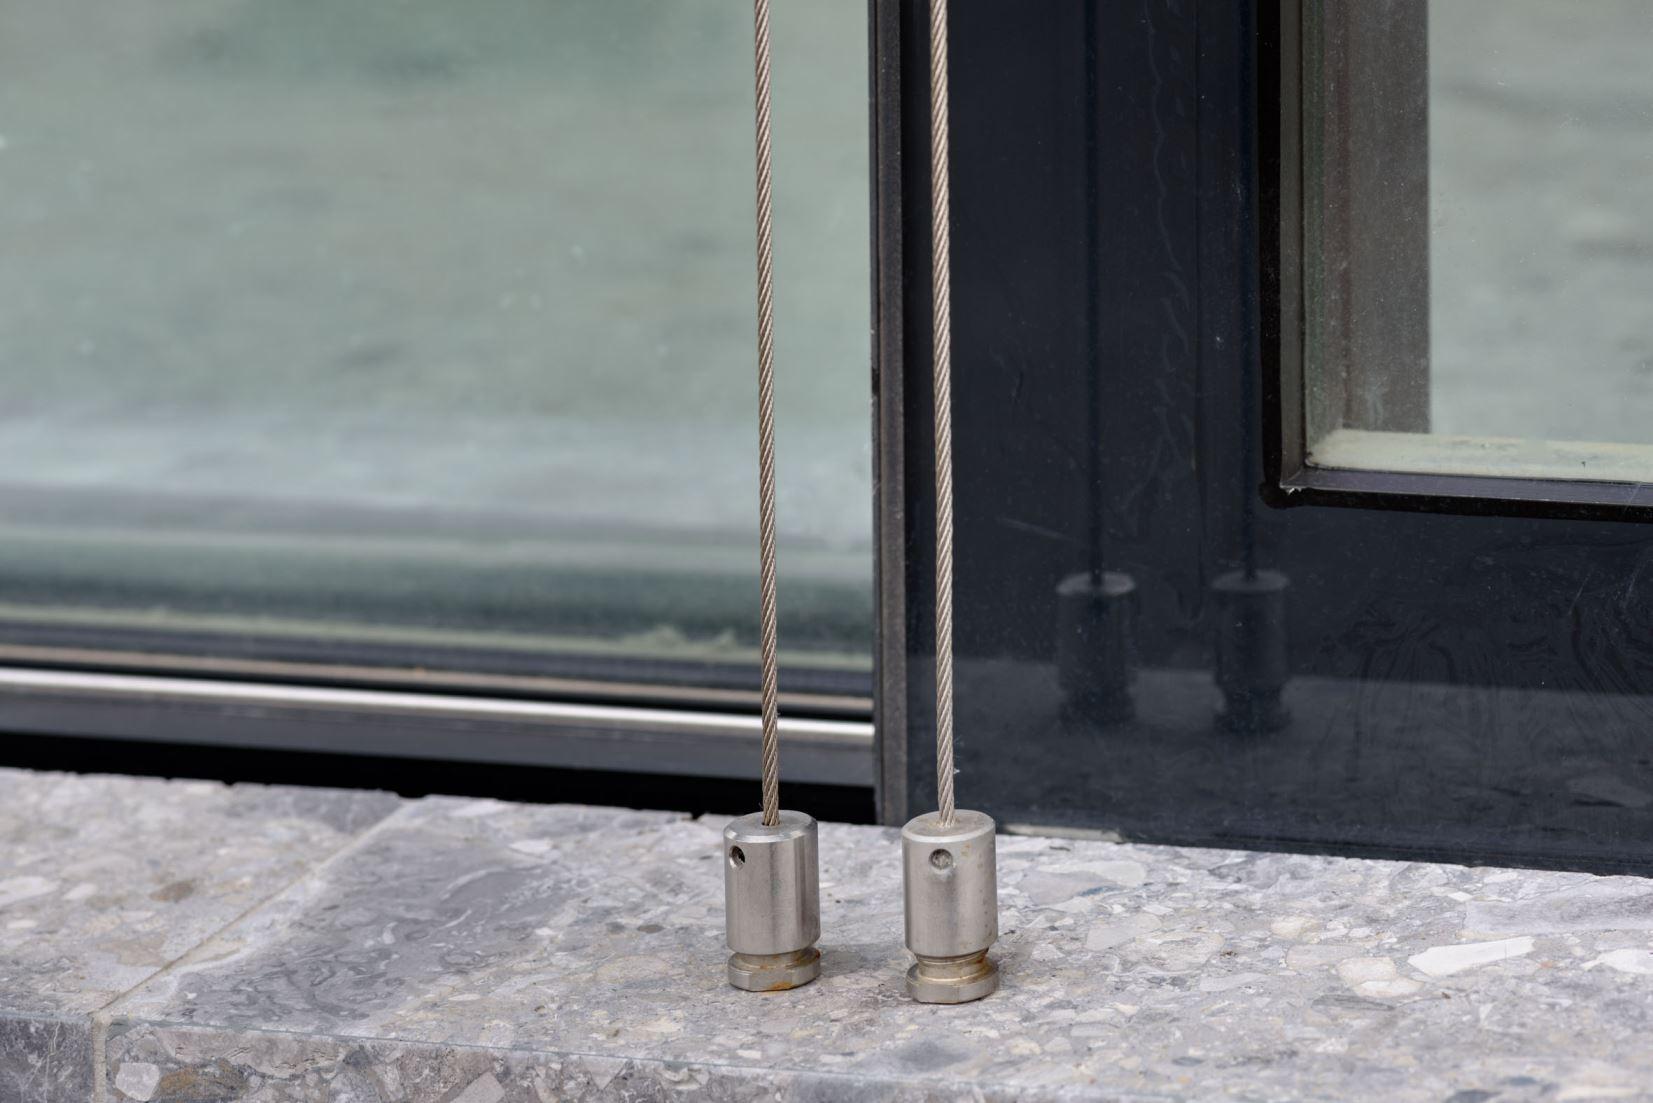 wbuild bouw- en projectcoördinatie Aalst moderne architectuur afwatering